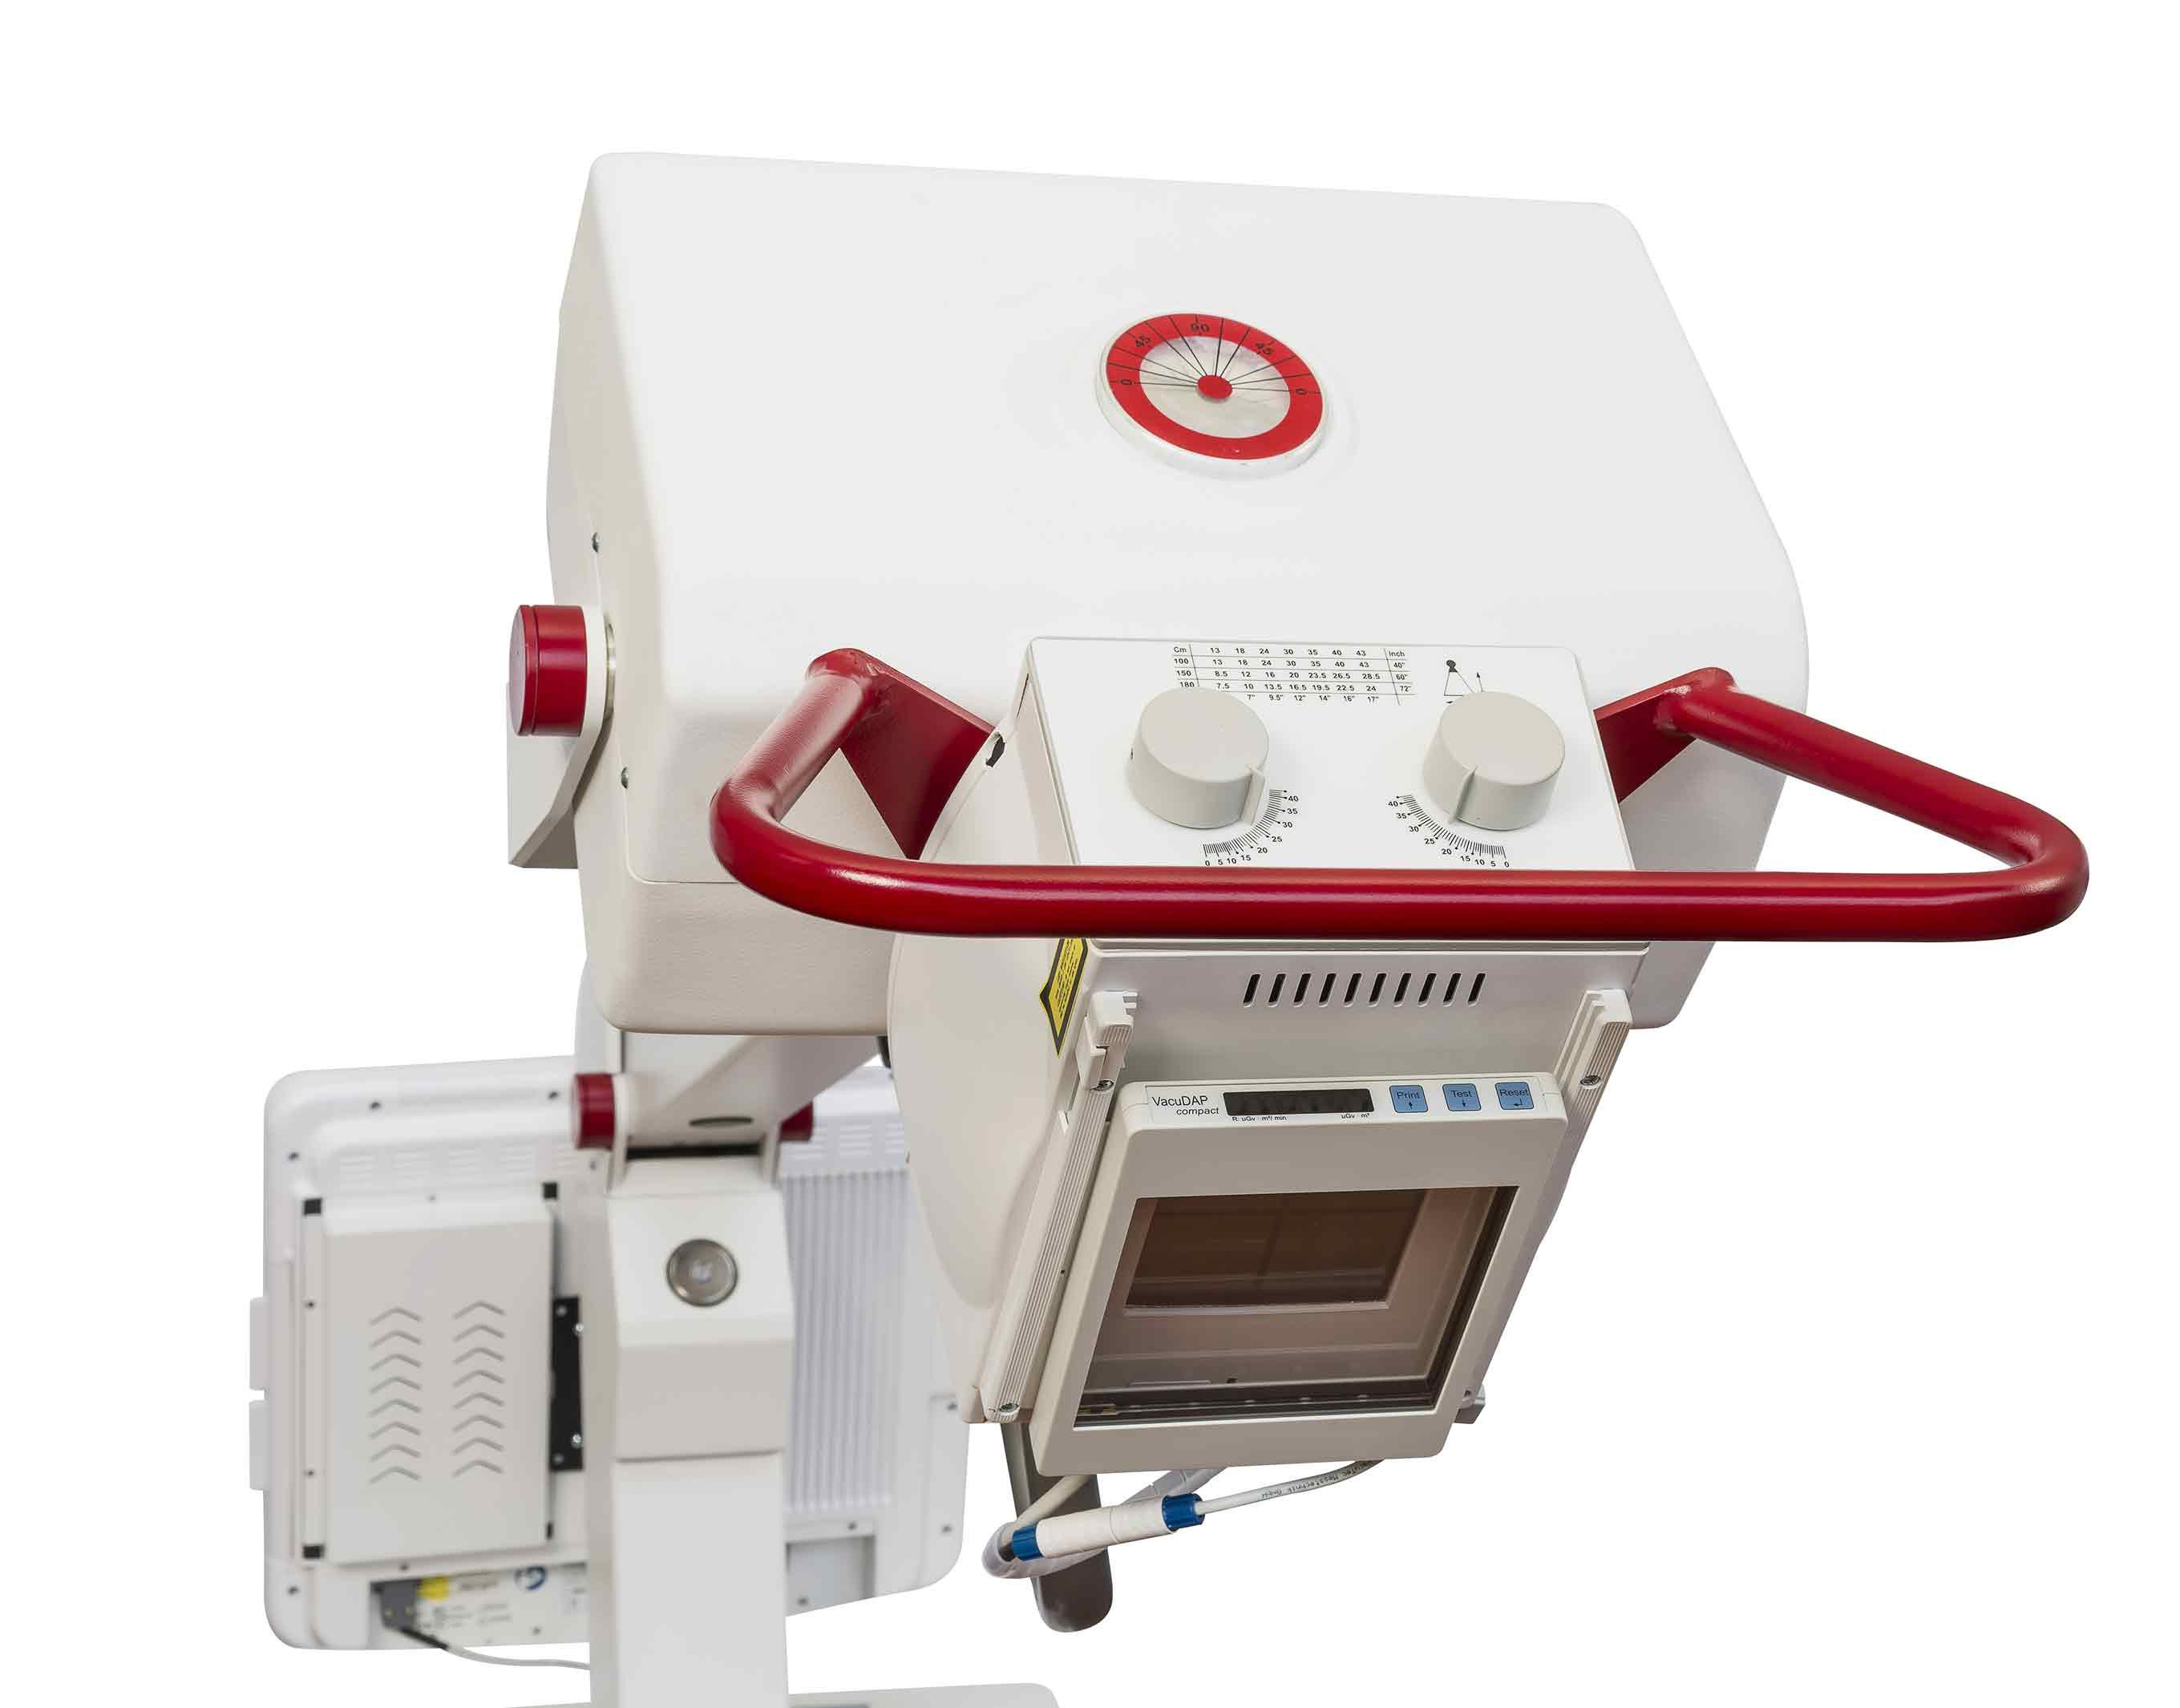 gilrdoni-caleidon-evo-unita-radiologiche-portatili